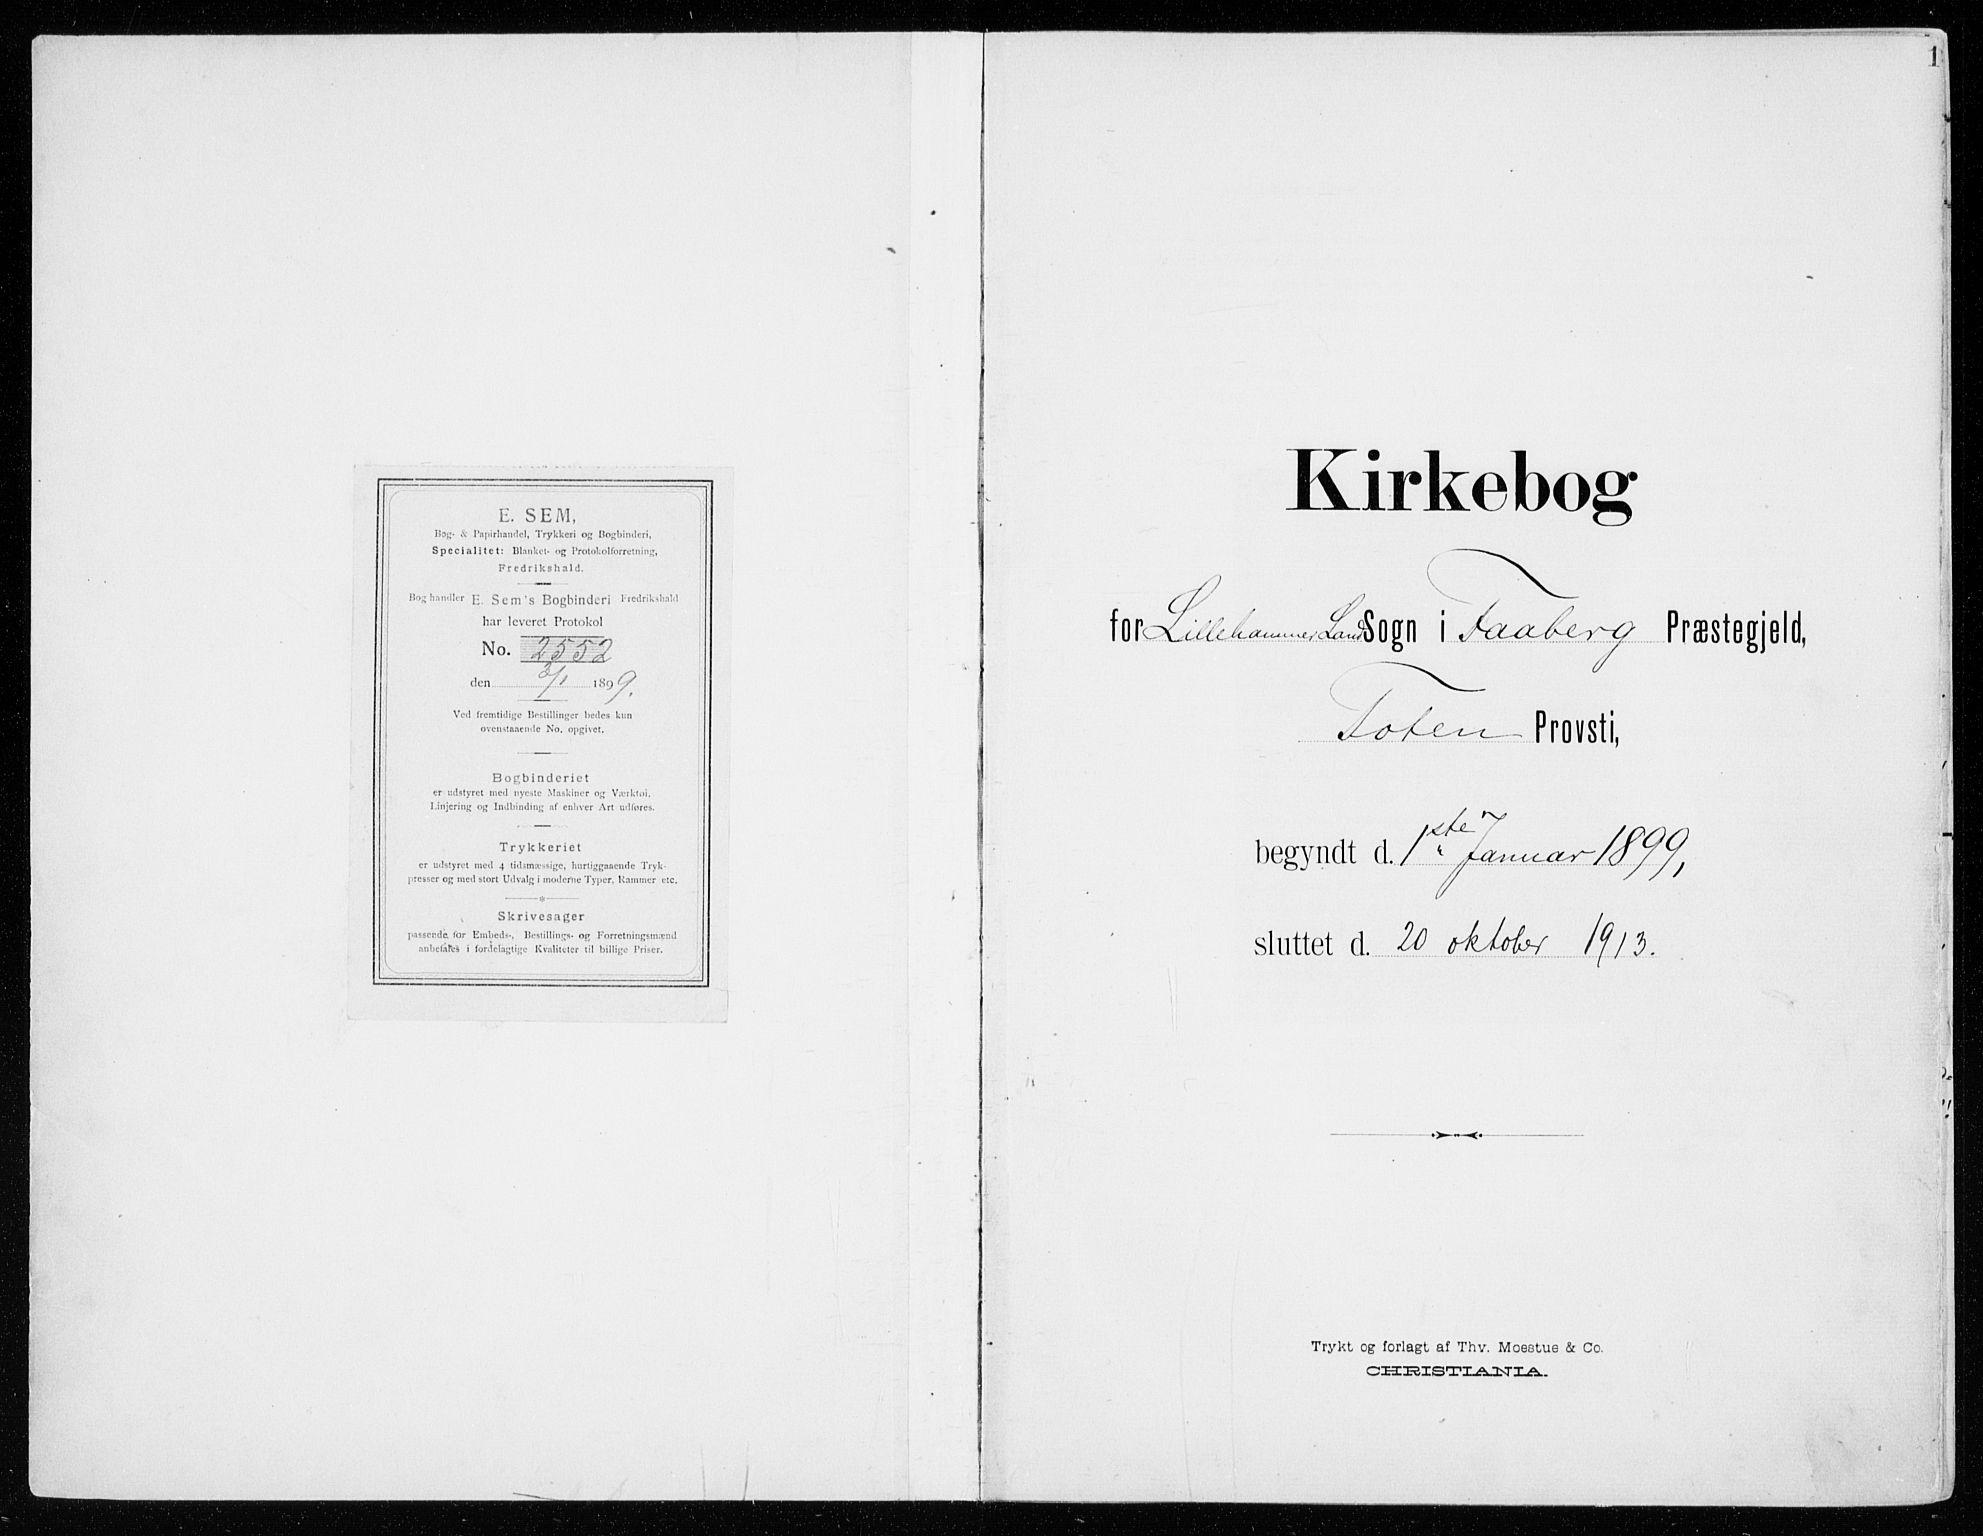 SAH, Fåberg prestekontor, Ministerialbok nr. 11, 1899-1913, s. 1